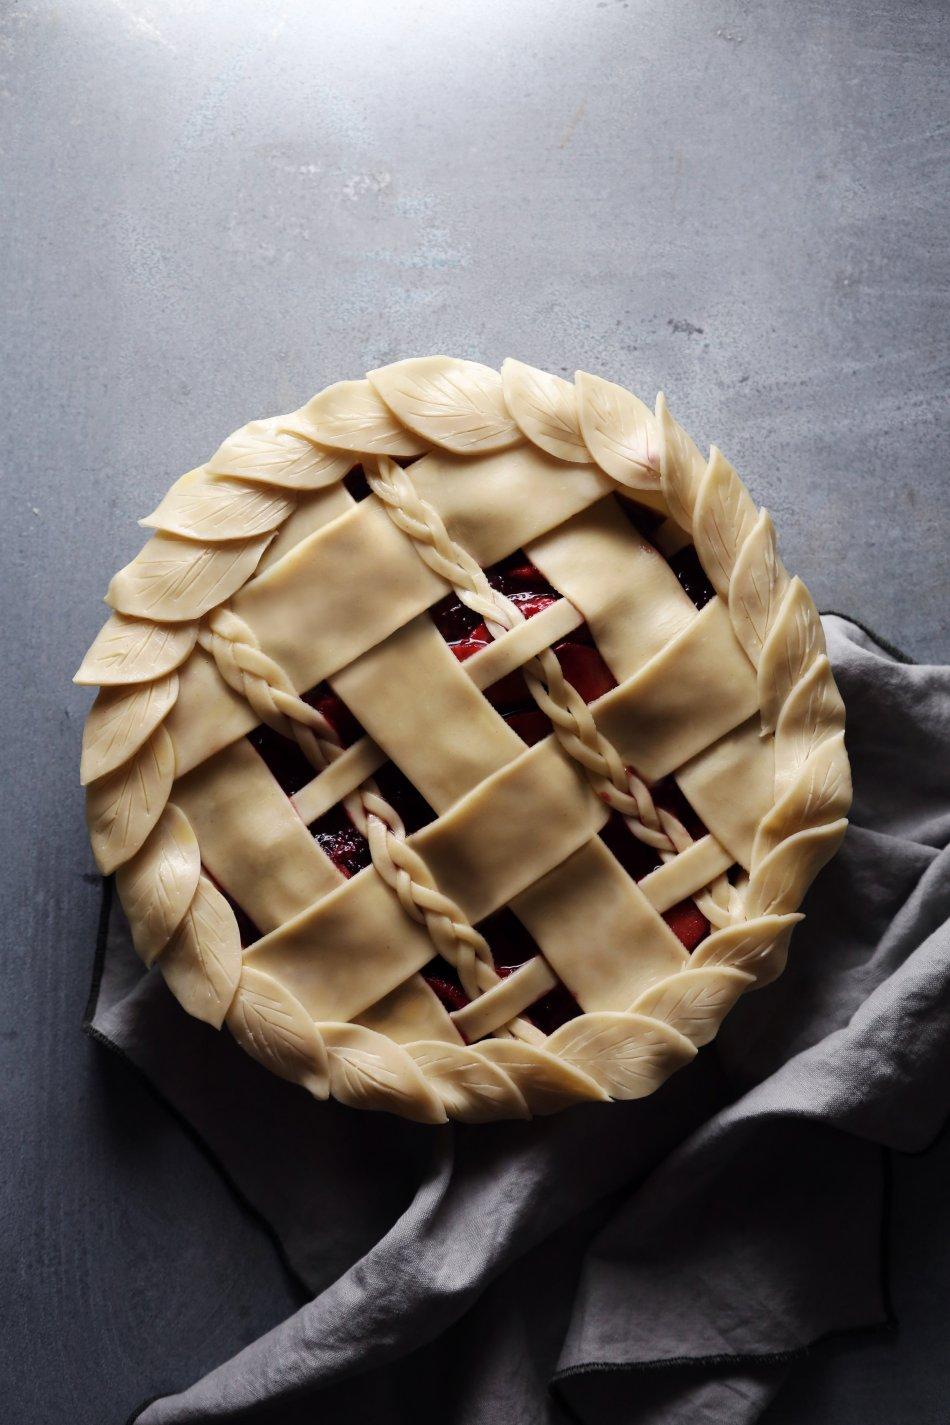 Apple-Blackberry Pie with Braided Lattice Crust | Refined Sugar Free. Dairy + Gluten Alternatives Included.